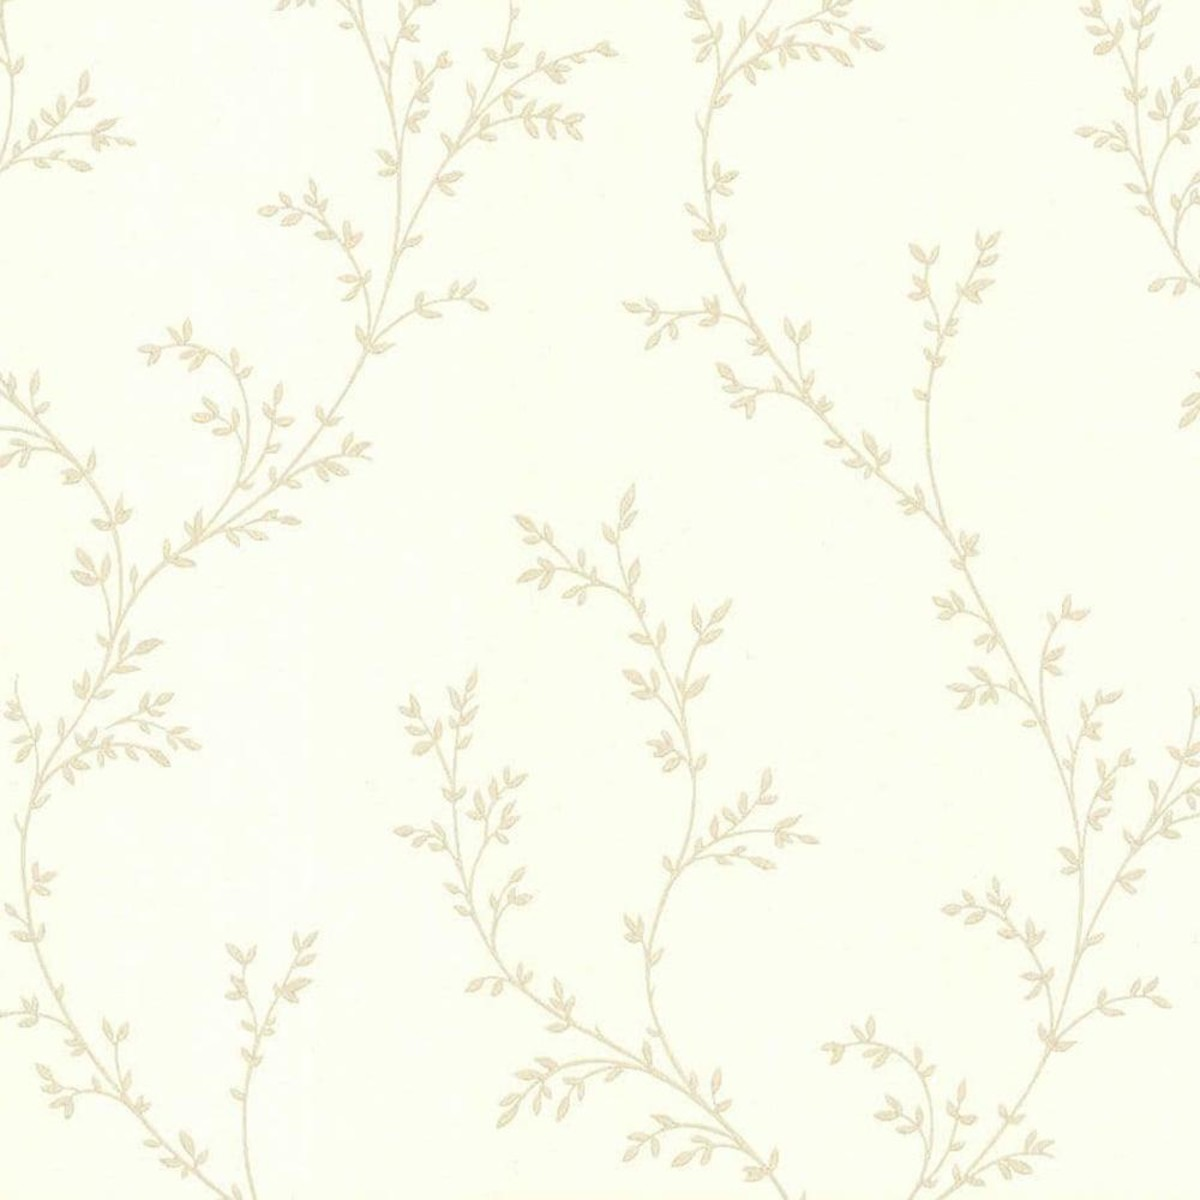 Обои флизелиновые 1838 Wallcoverings Rosemore бежевые 0.53 м 1601-103-03